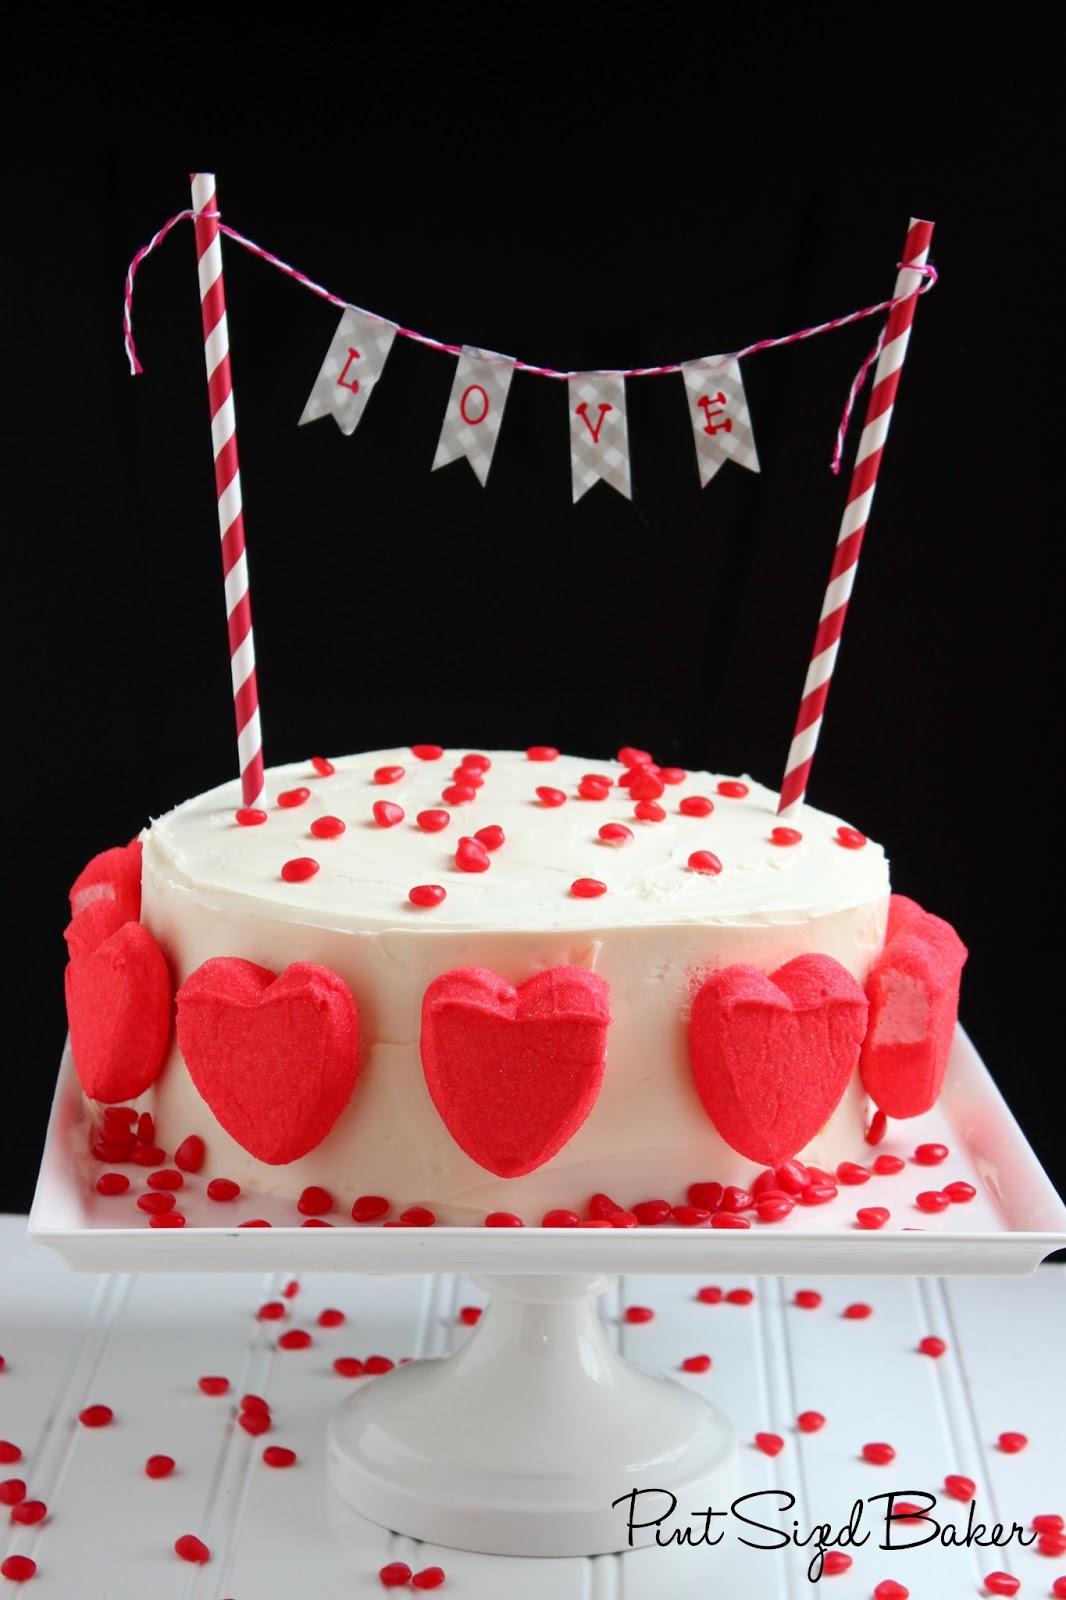 Simple, yet Pretty Valentine's Cake - Pint Sized Baker